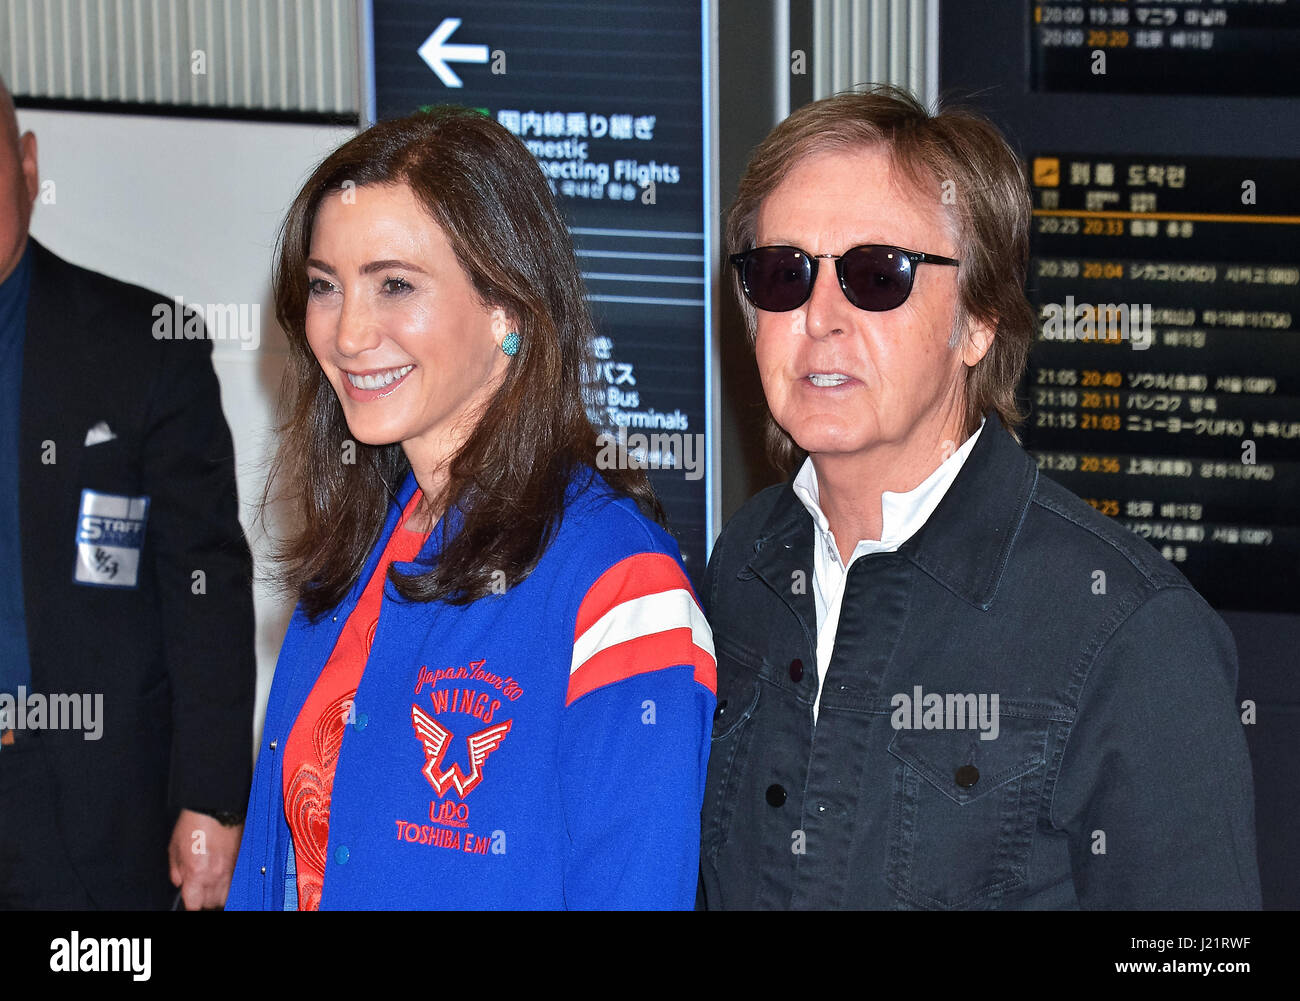 Paul McCartney Tokyo Japan April 23 2017 Sir Arrives At International Airport In On